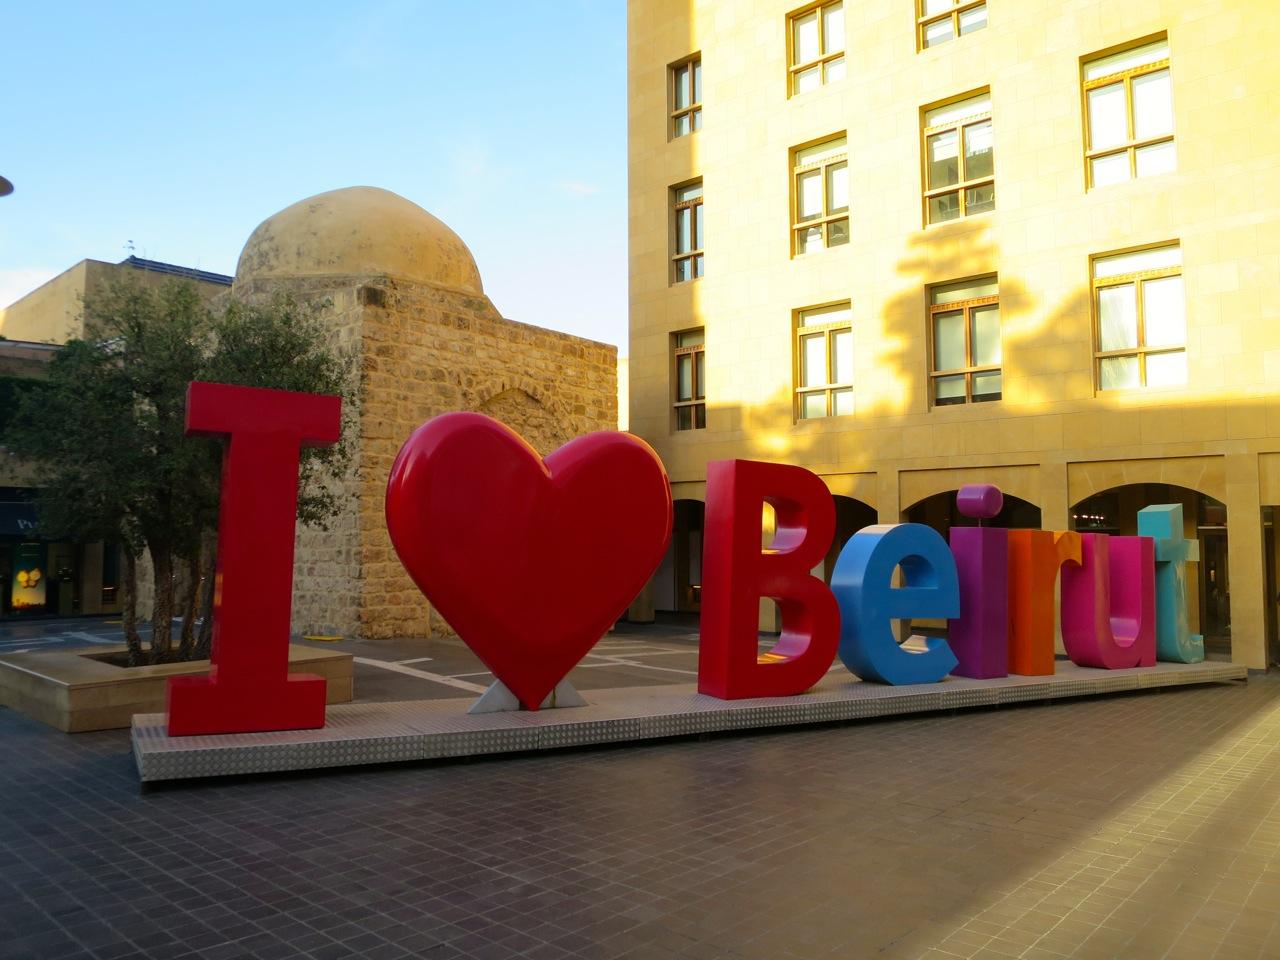 Beirute 2 01